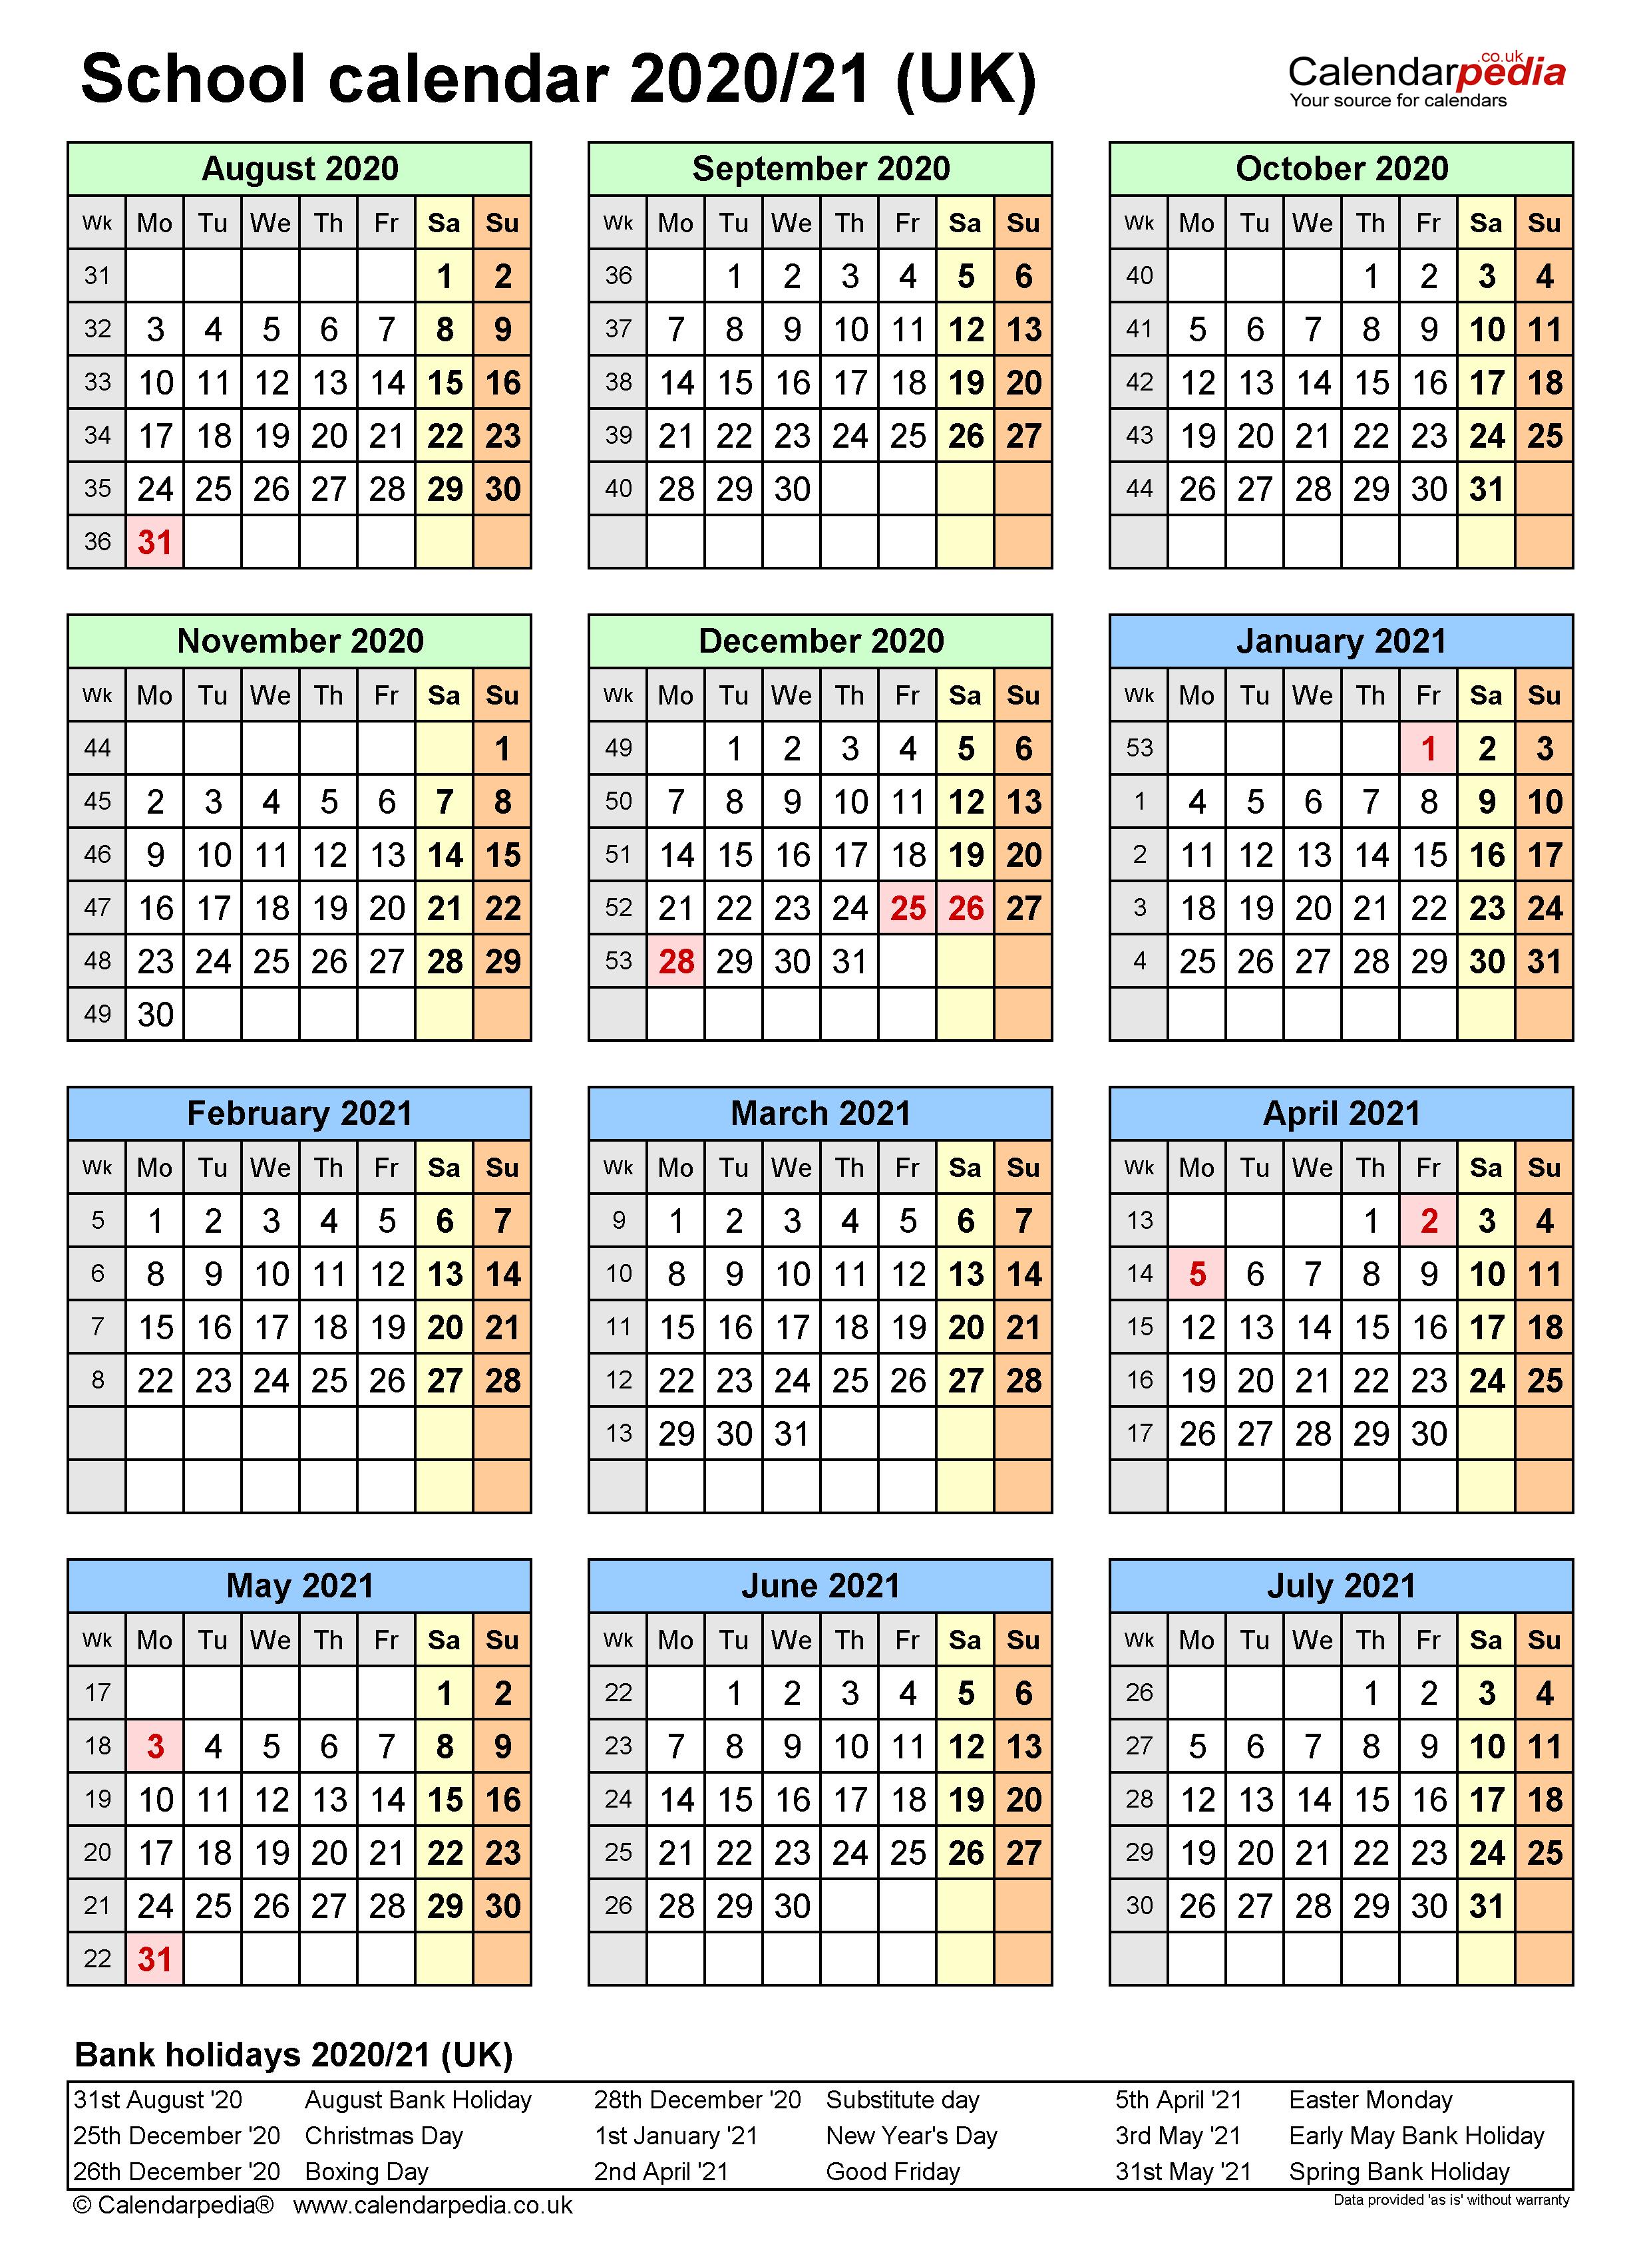 School Calendars 2020/2021 As Free Printable Word Templates With Colorado Springs District 20 2021 20 School Calendar